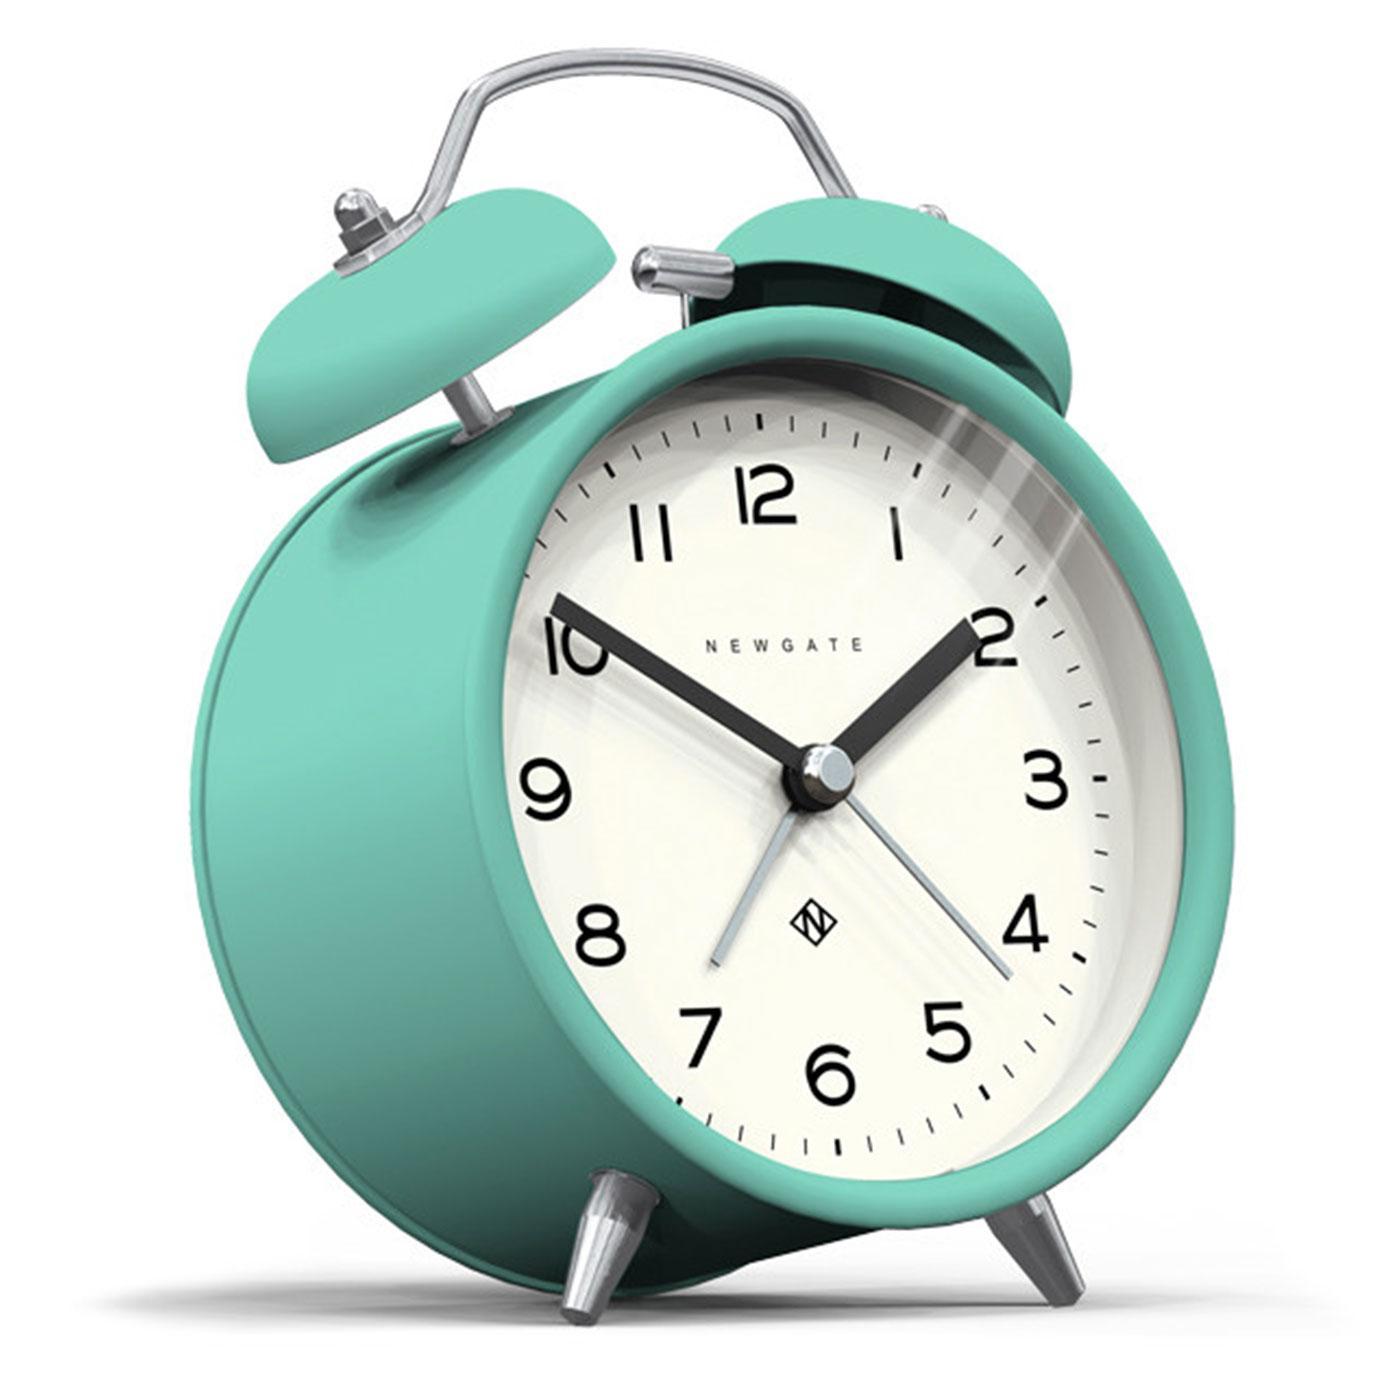 Echo NEWGATE CLOCKS Retro Bell Alarm Clock in Aqua